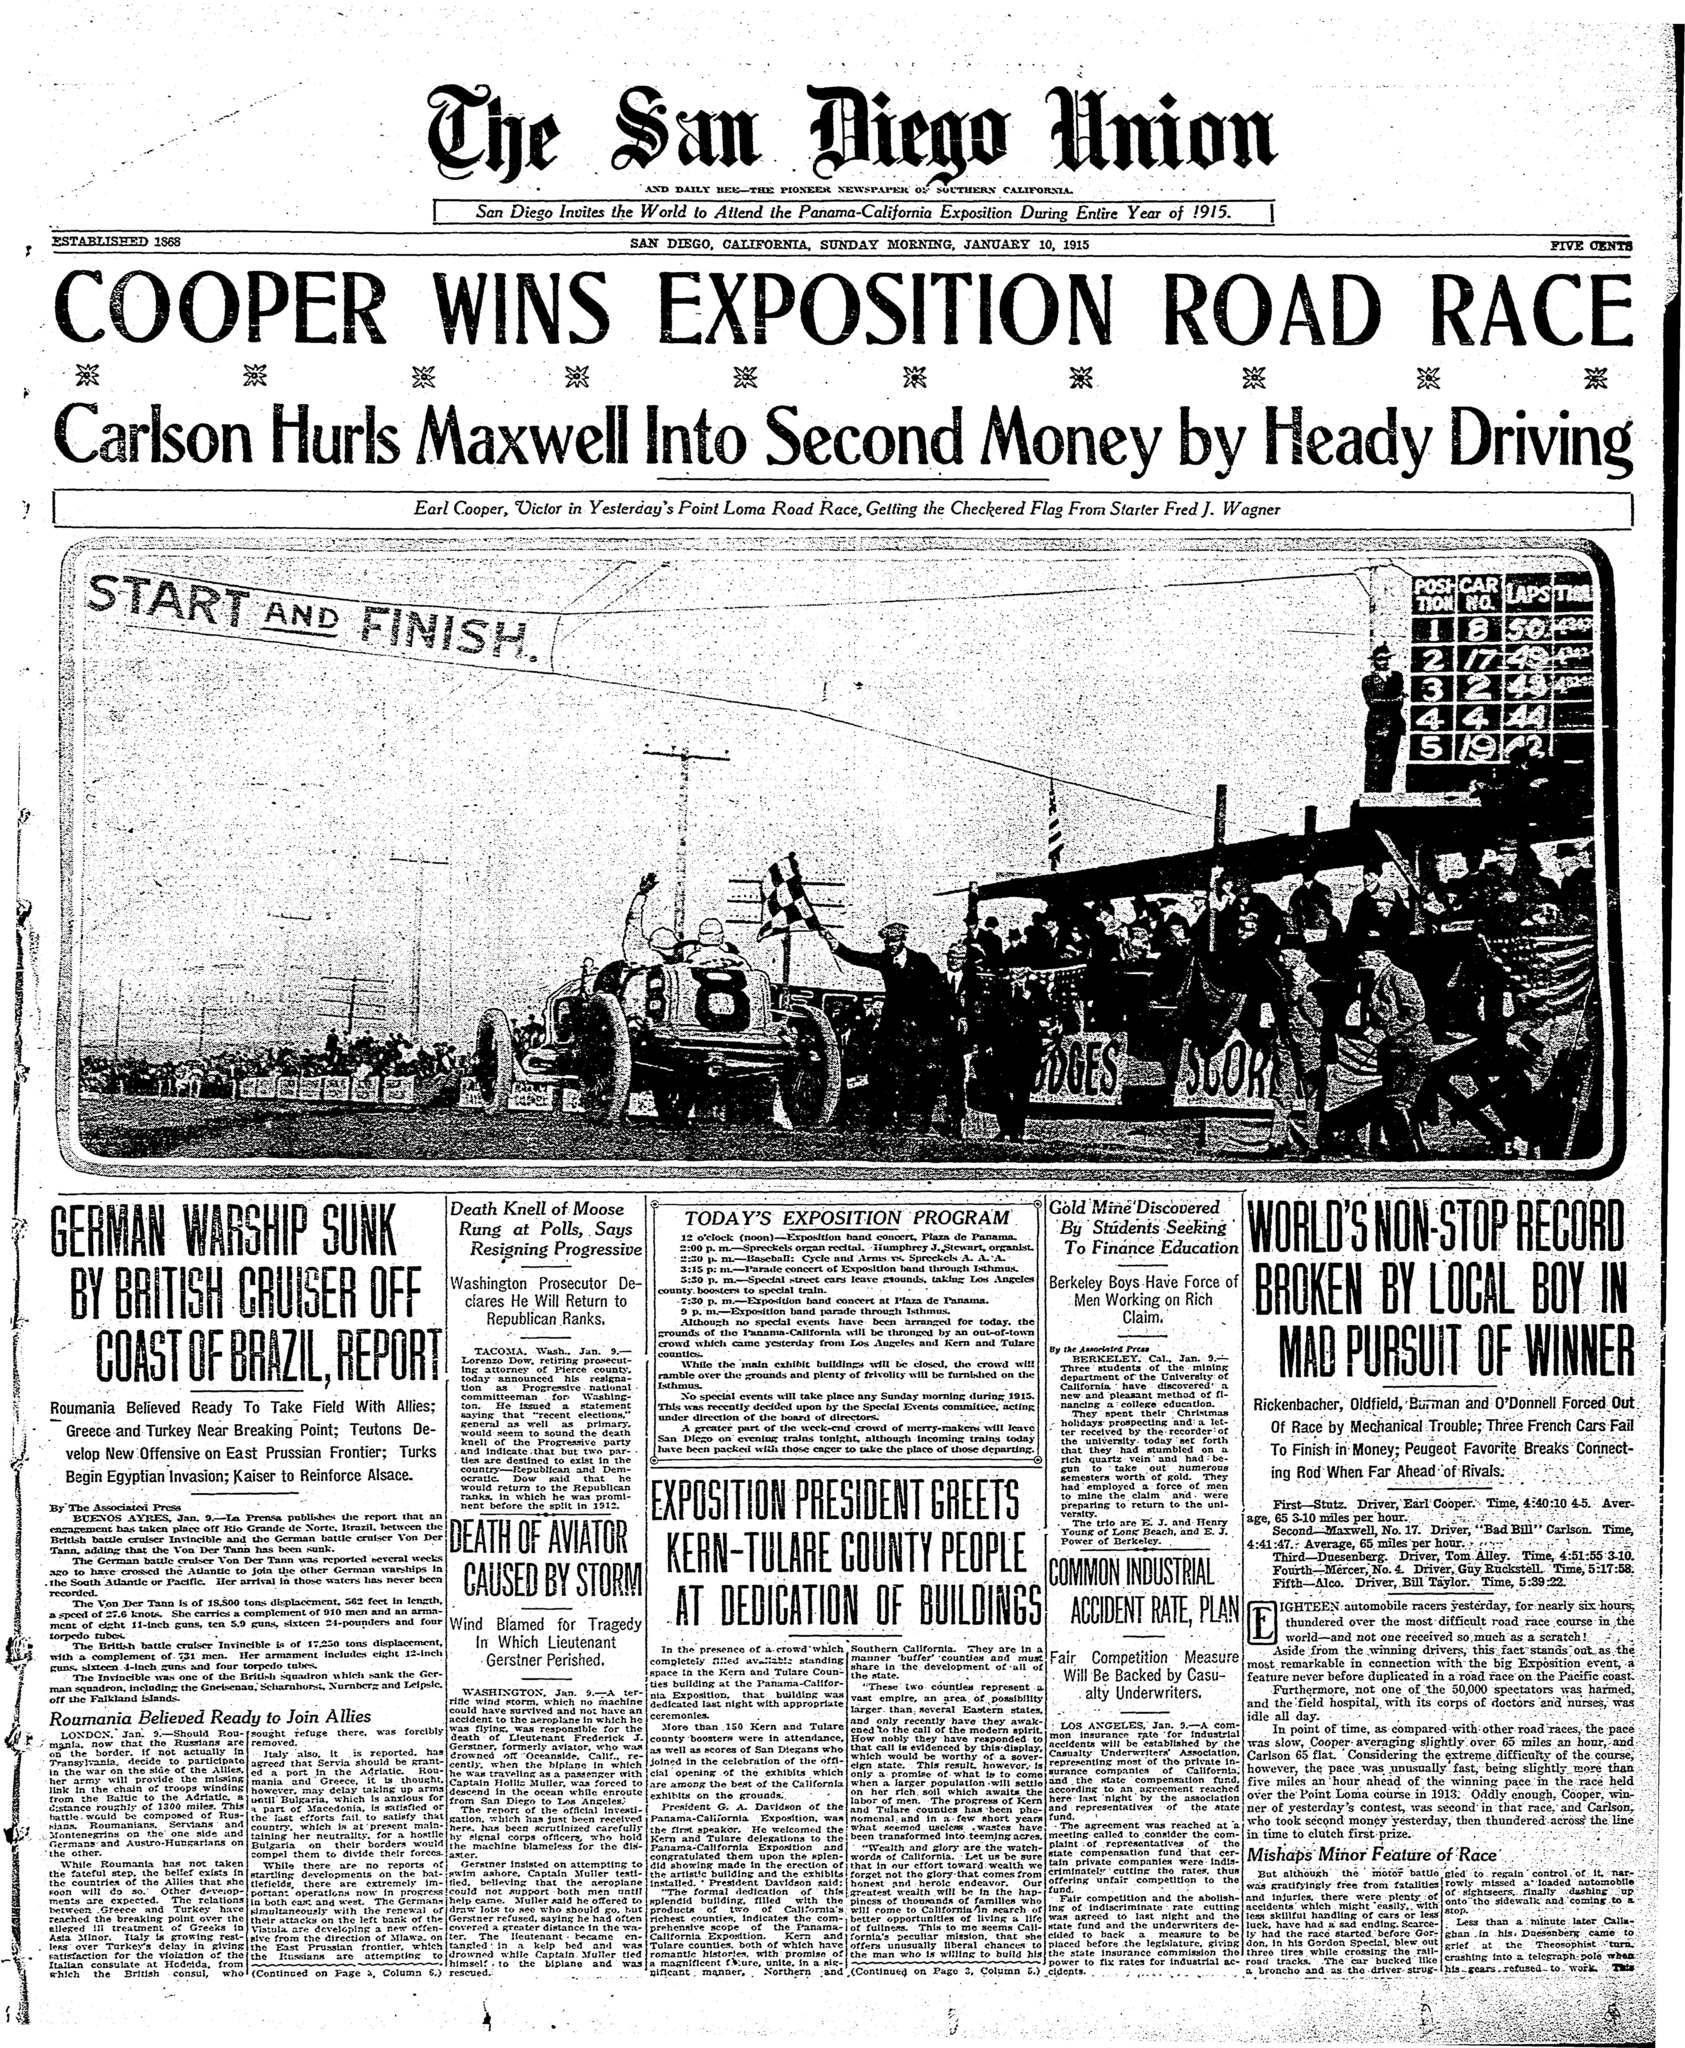 January 10, 1915